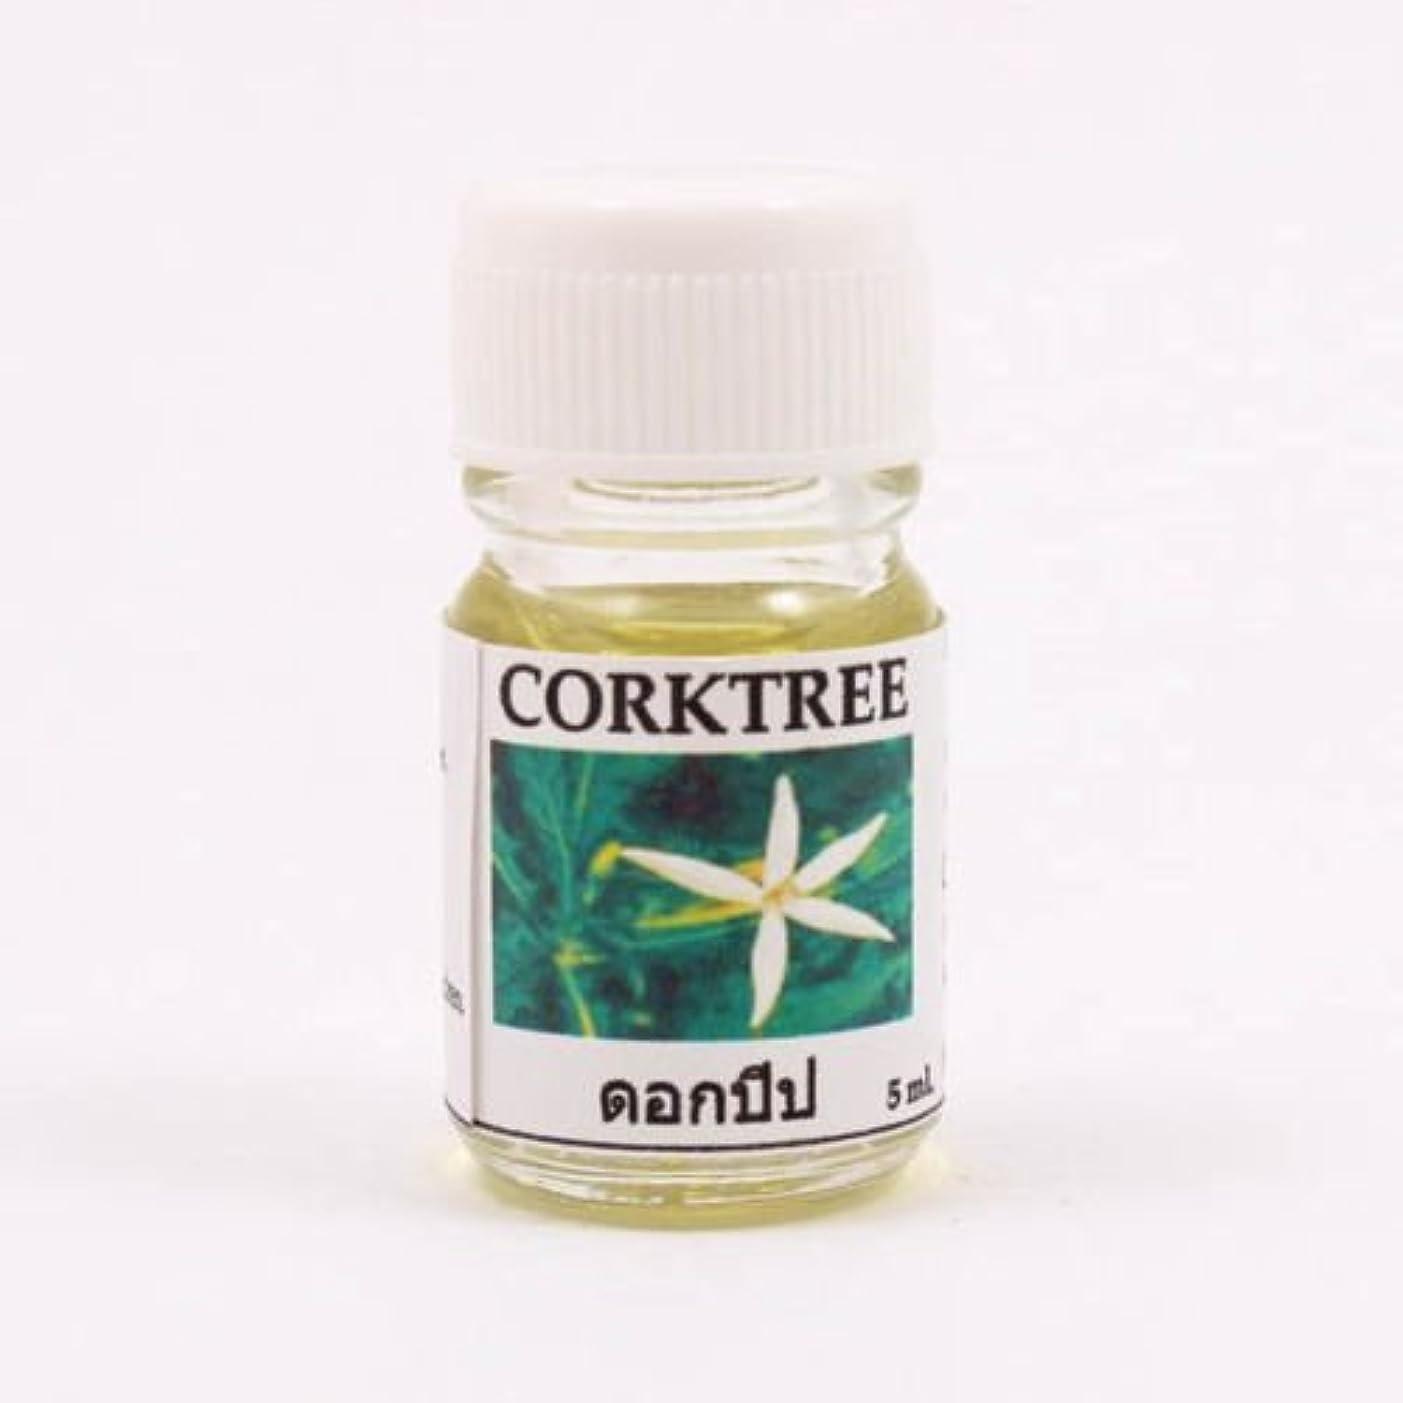 6X Cork Tree Aroma Fragrance Essential Oil 5ML. Diffuser Burner Therapy